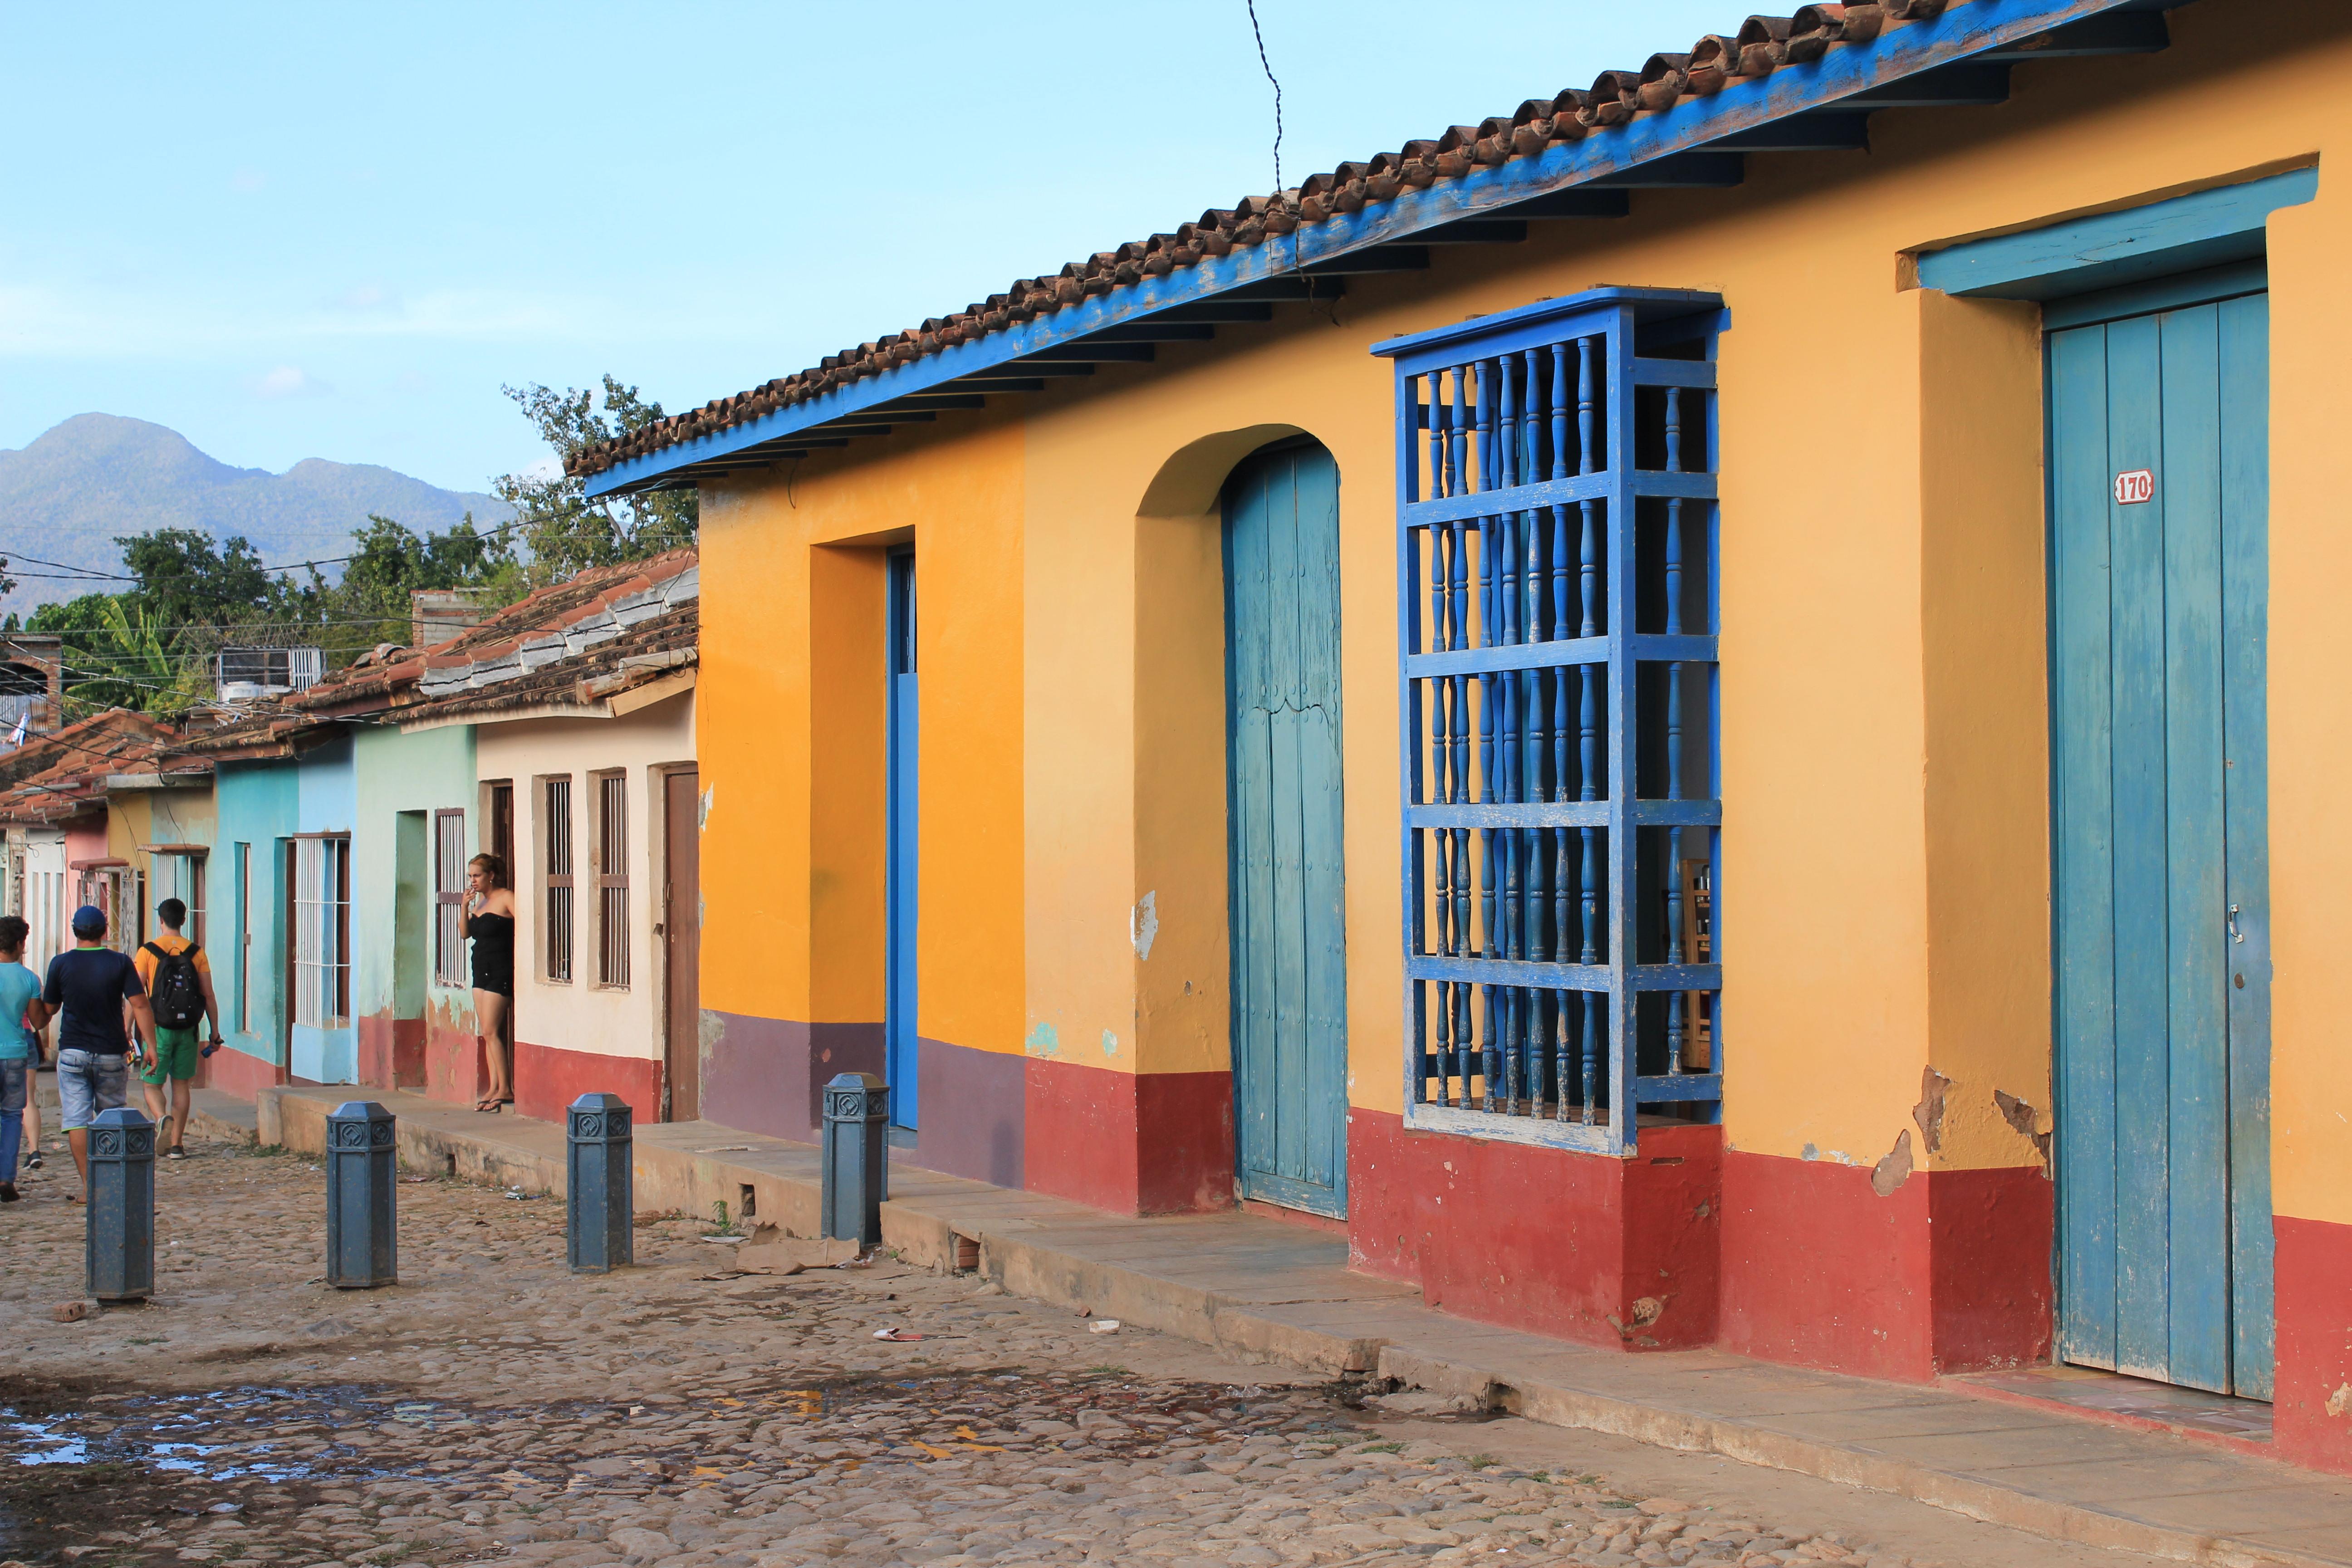 IMG_8527 A Cuban Road Trip, Part 2 - Trinidad Cuba Trinidad